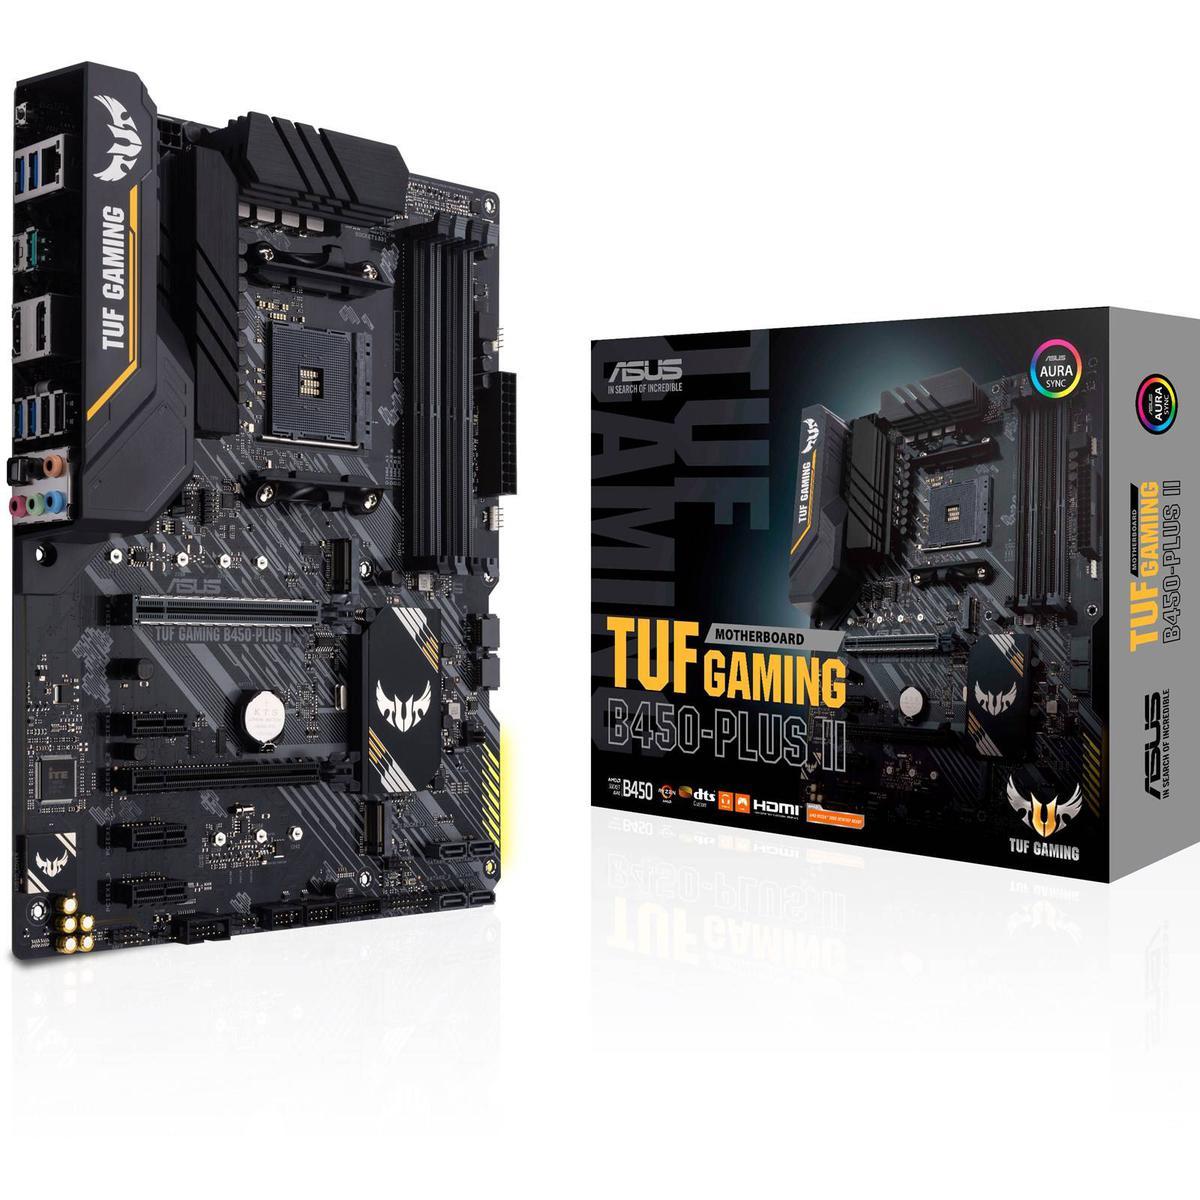 Asus TUF GAMING B450-PLUS II ATX AM4 Motherboard